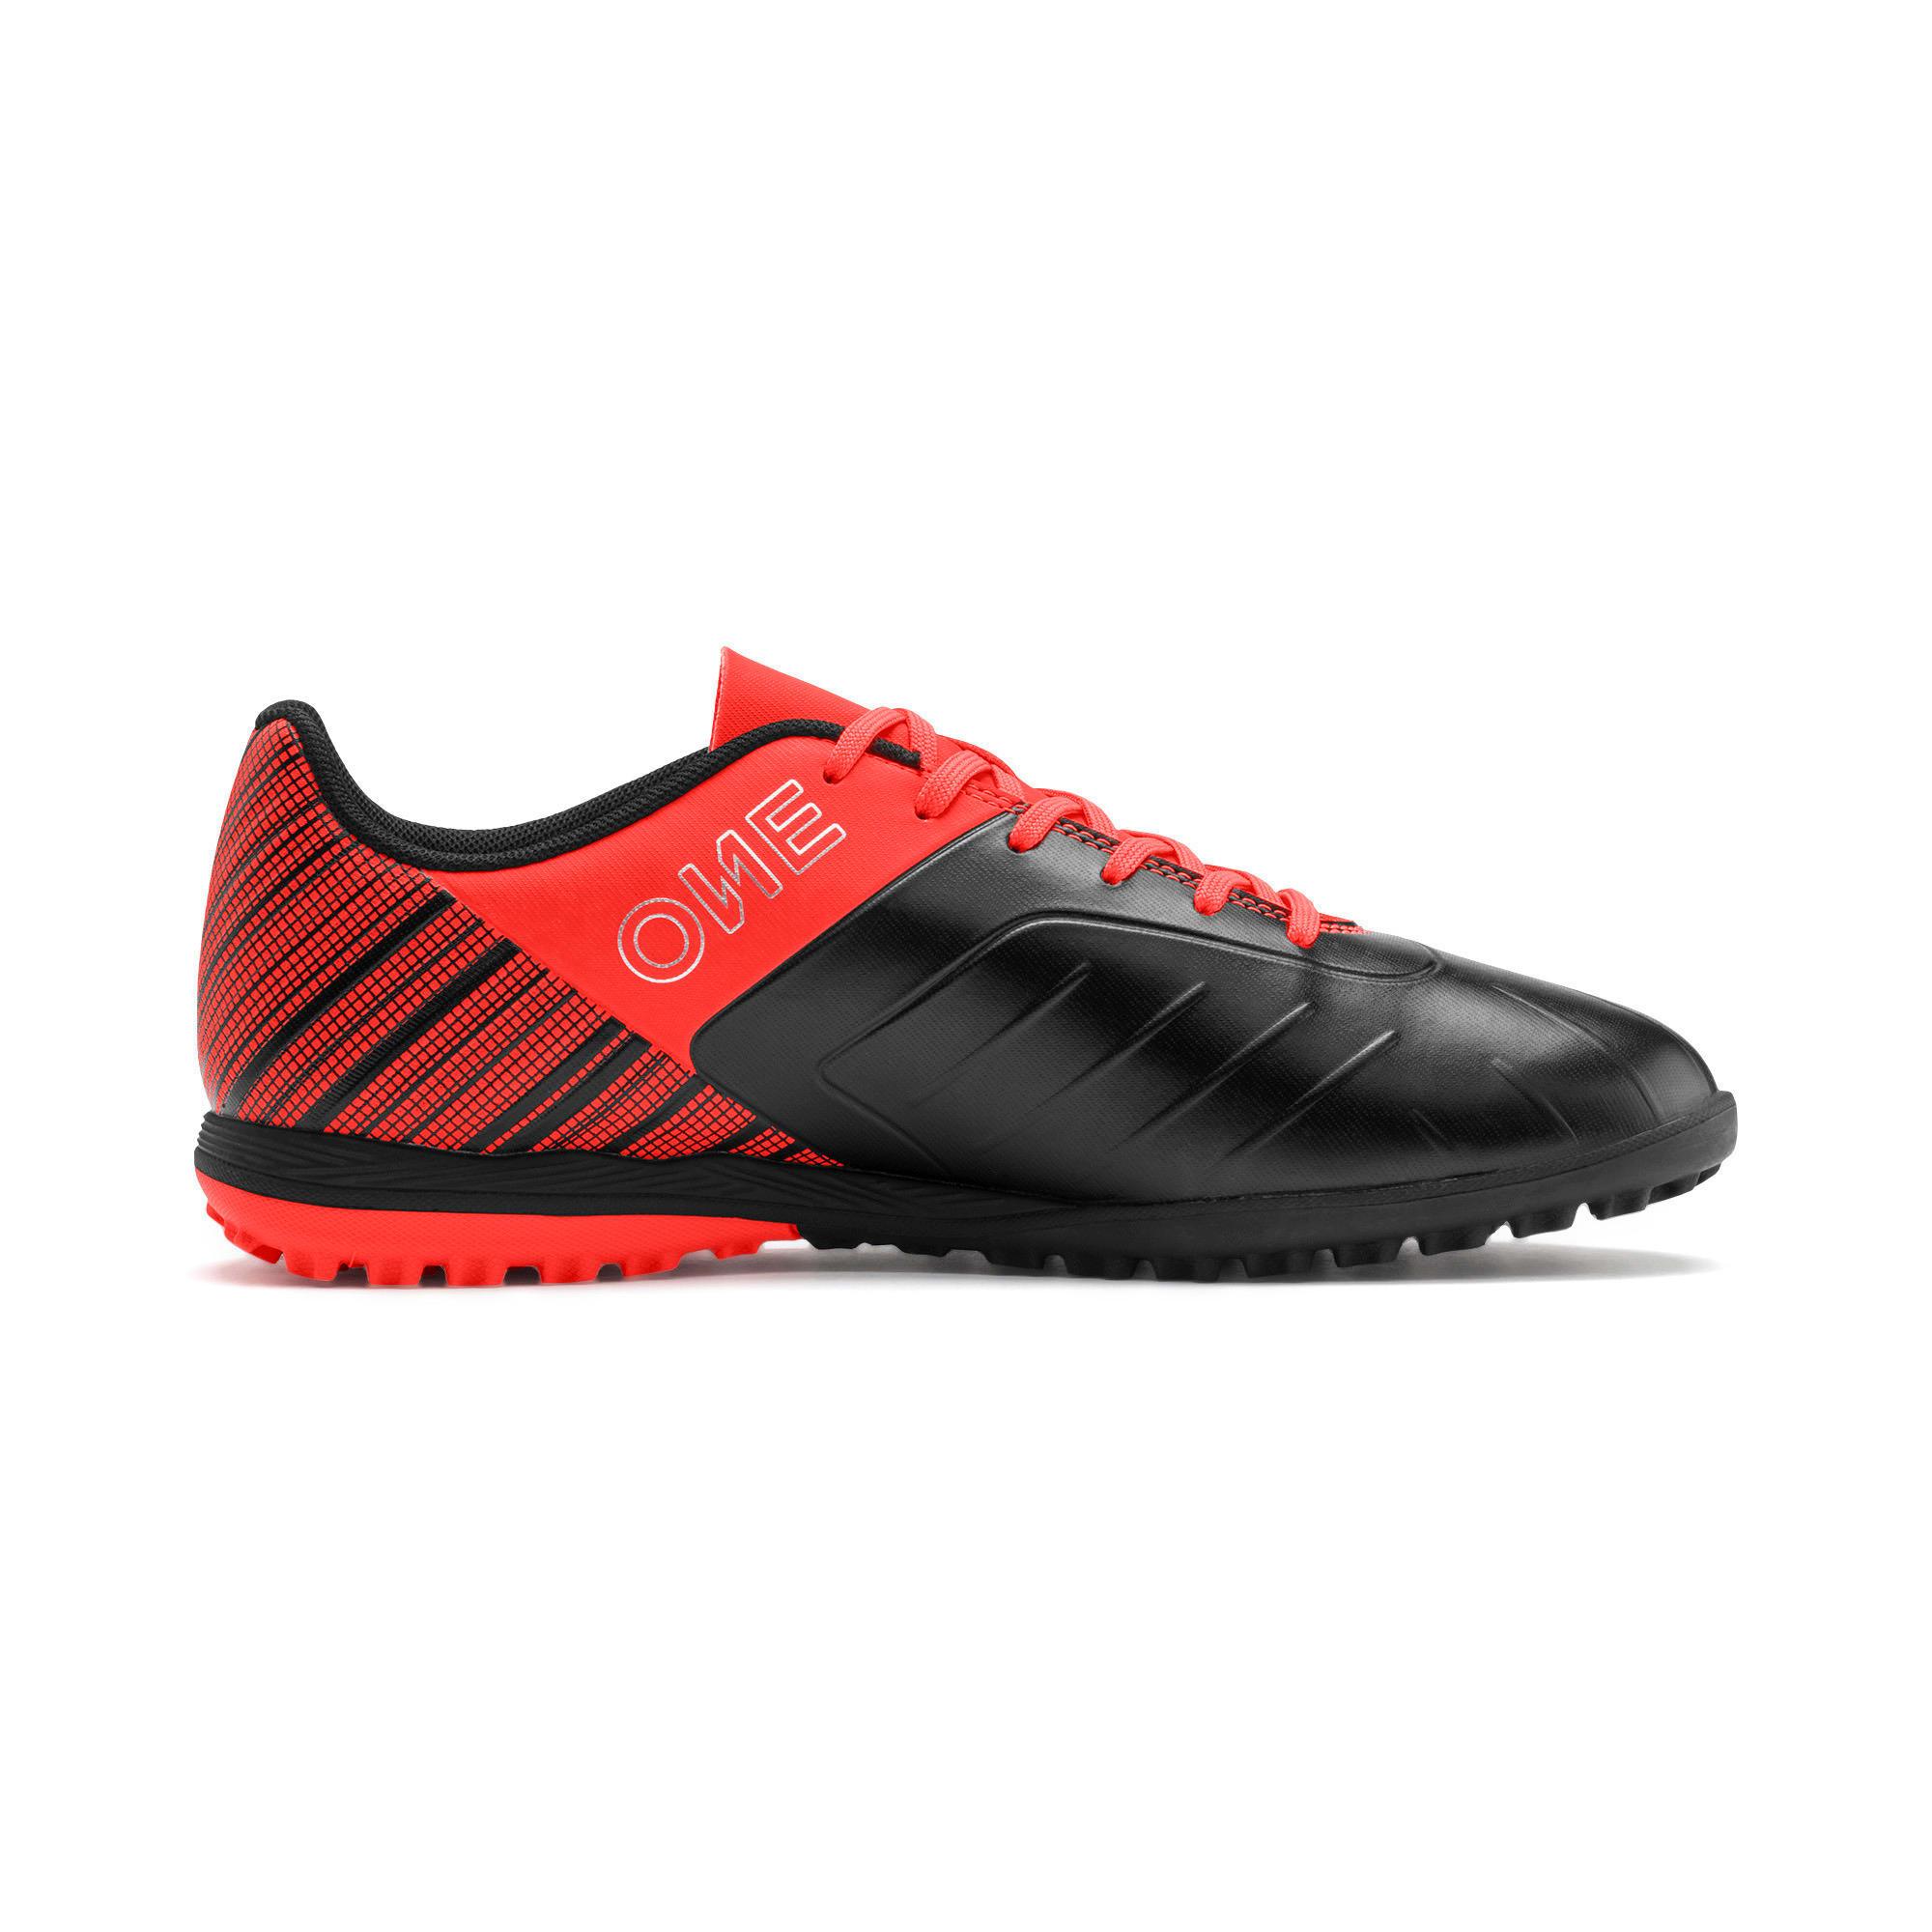 Thumbnail 6 of PUMA ONE 5.4 TT Men's Soccer Shoes, Black-Nrgy Red-Aged Silver, medium